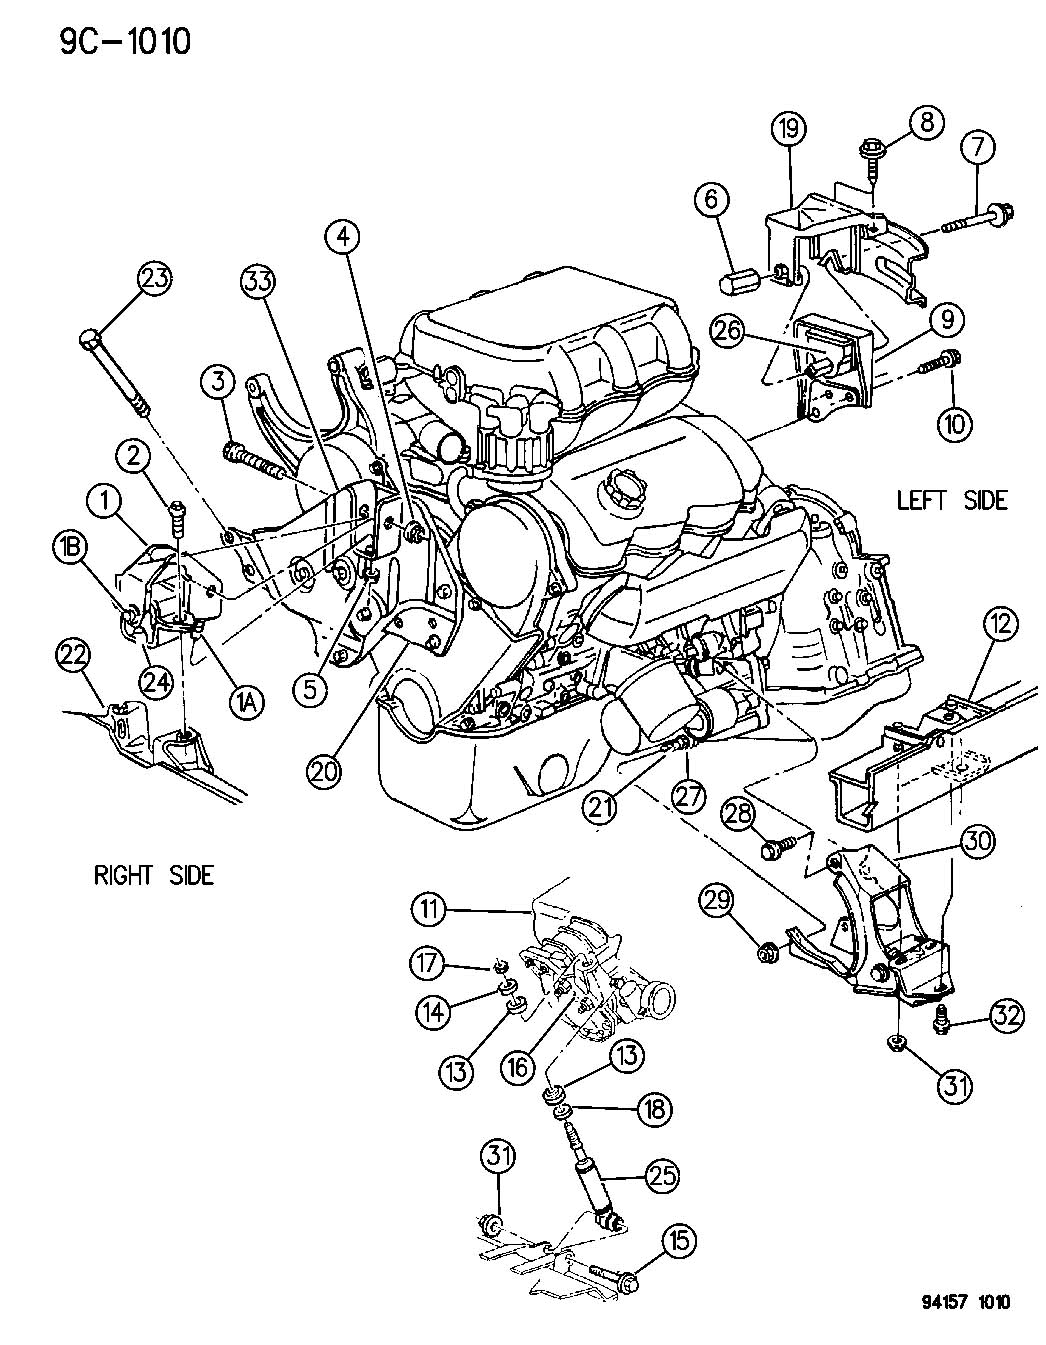 1995 Ford Aspire Fuse Box Ford E Series Fuse Box Wiring